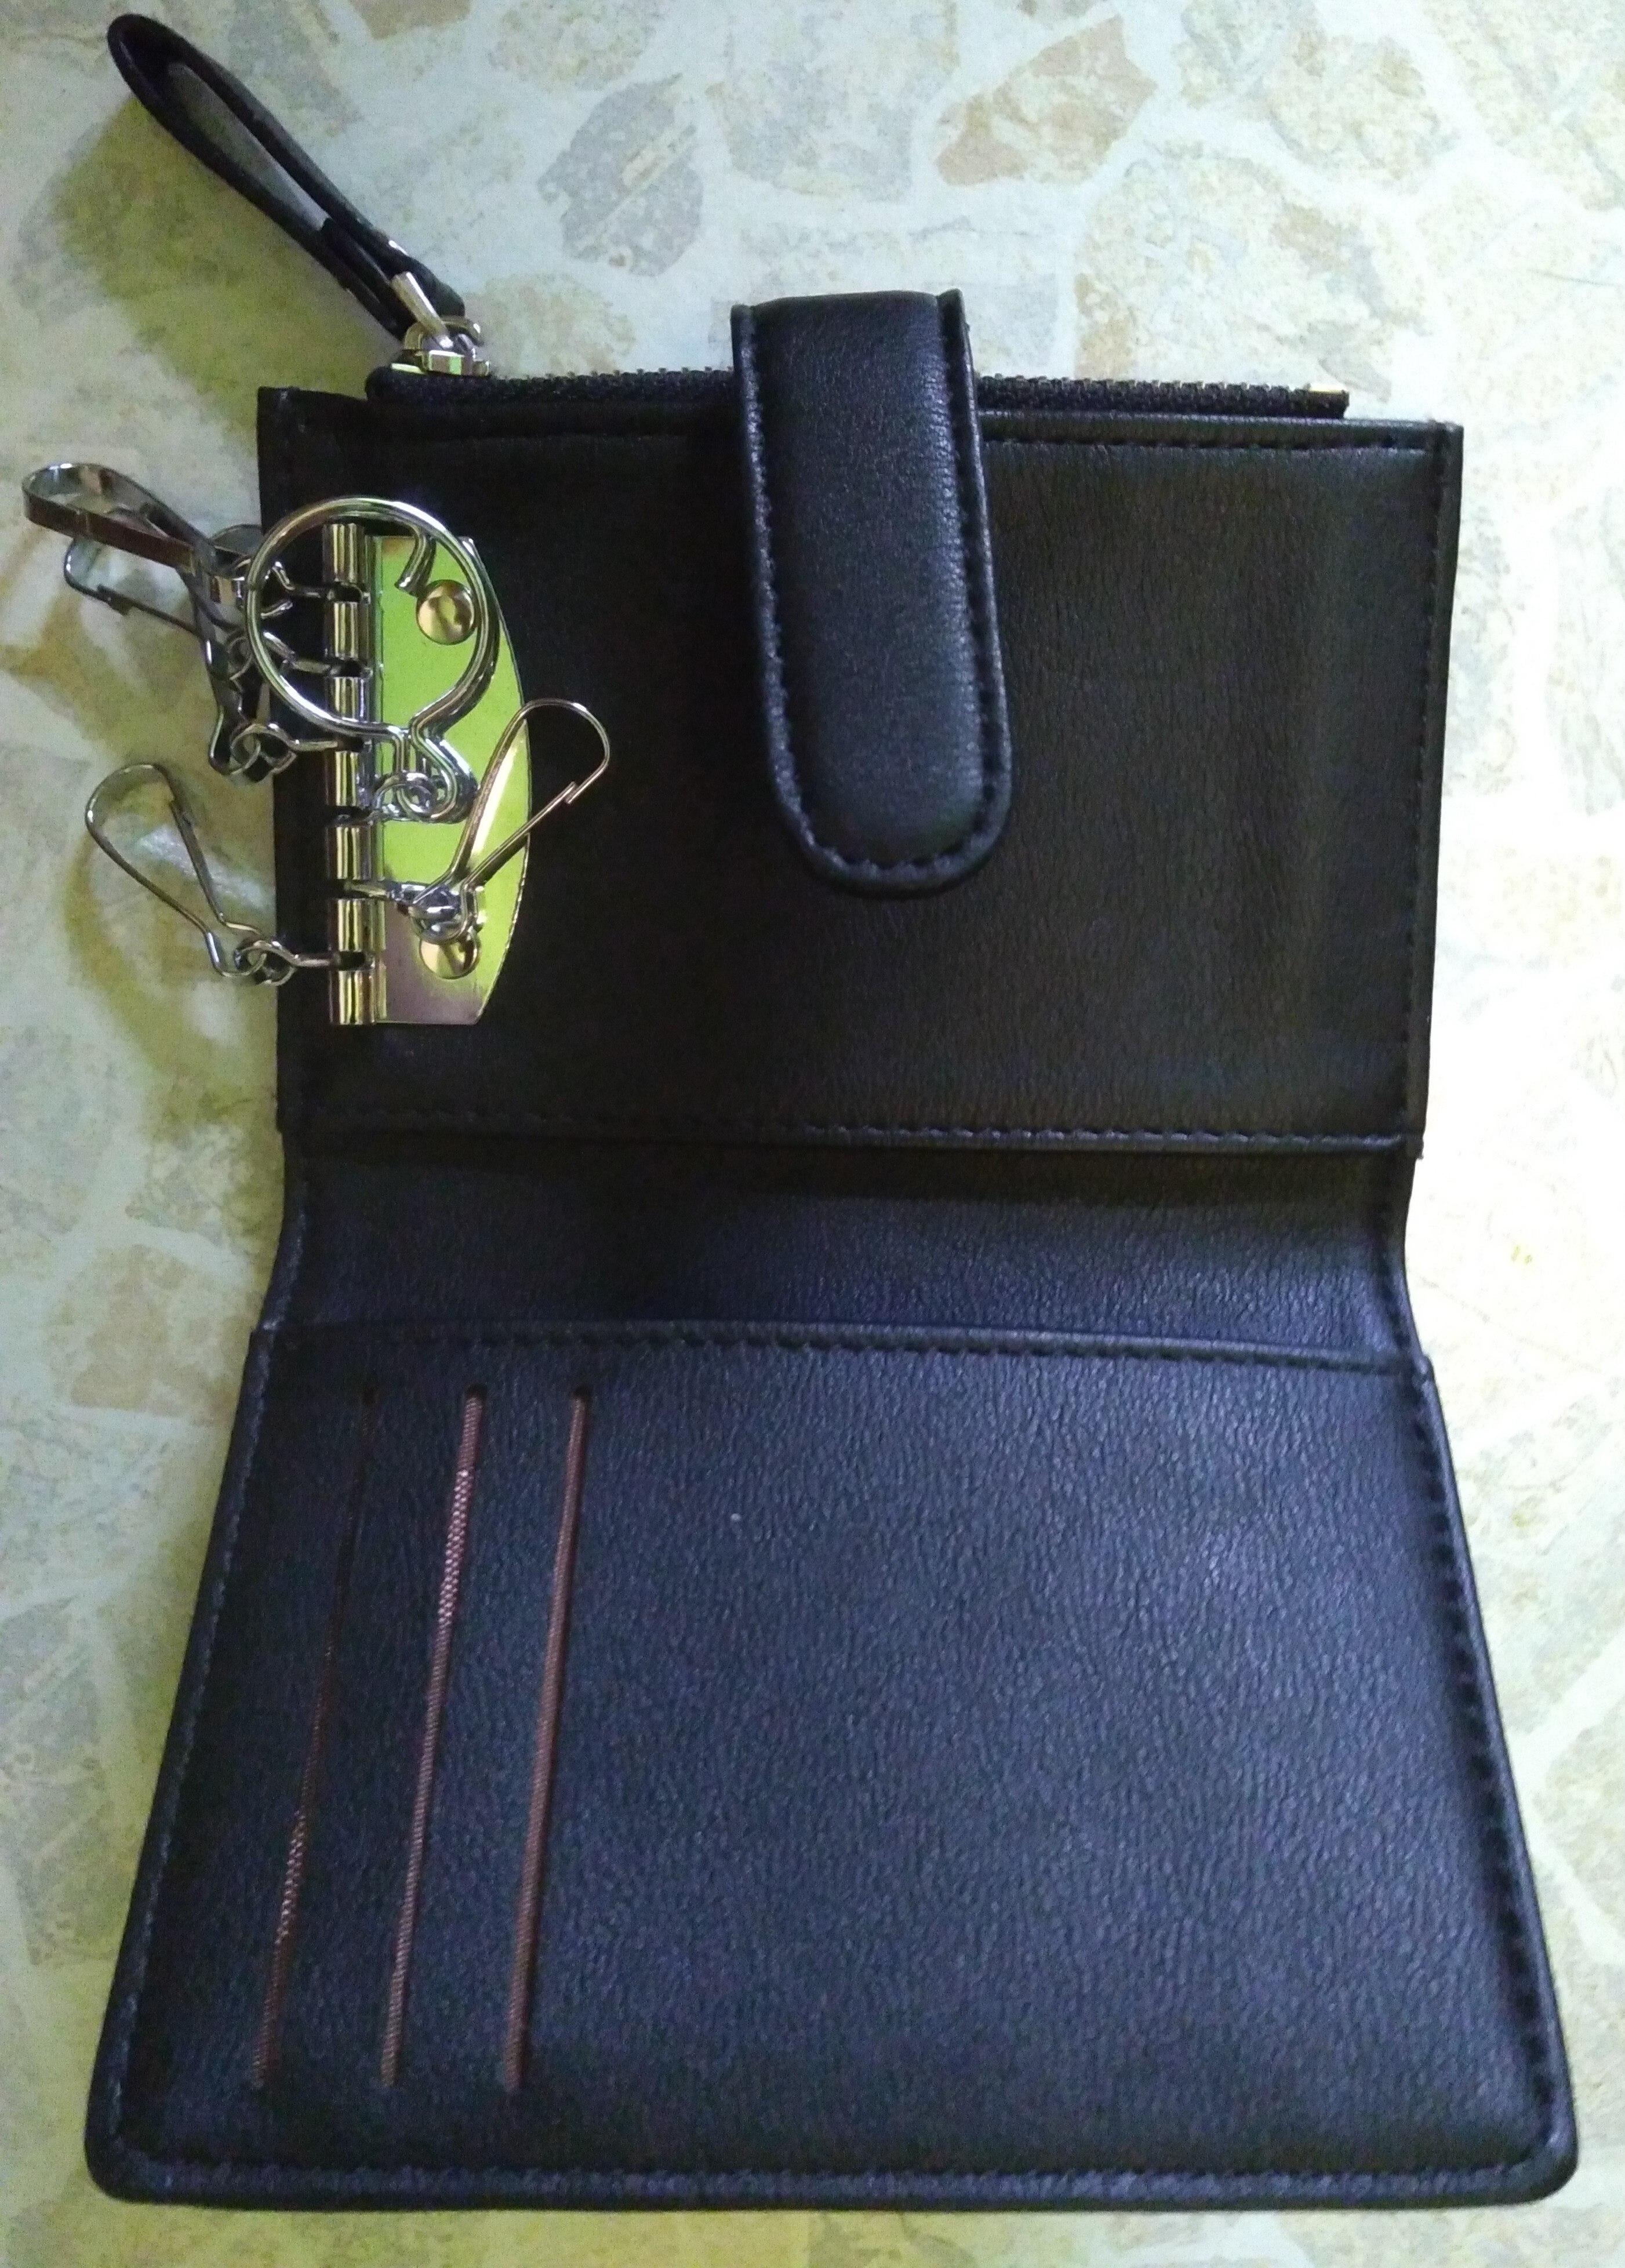 WEICHEN brand Car Key Holder for Women Key Wallets Housekeeper Keys Female Hasp Door Key Chain Organzier Key purse Coin Bag photo review